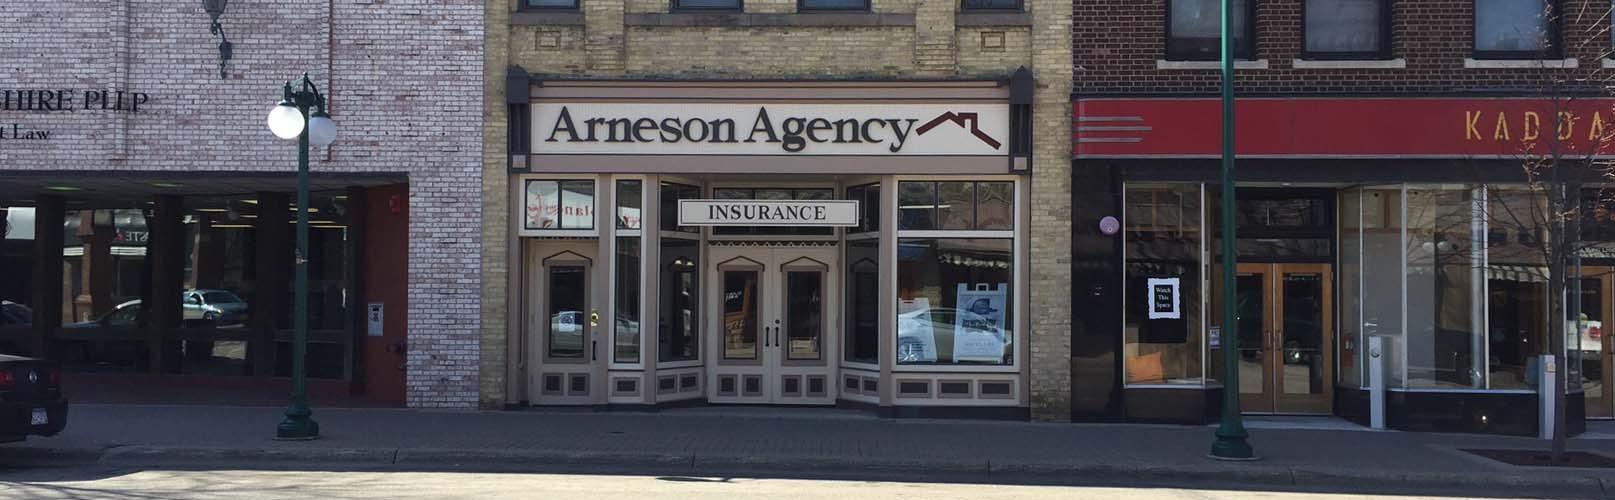 Arneson-Agency-Insurance-Fergus-MOD3